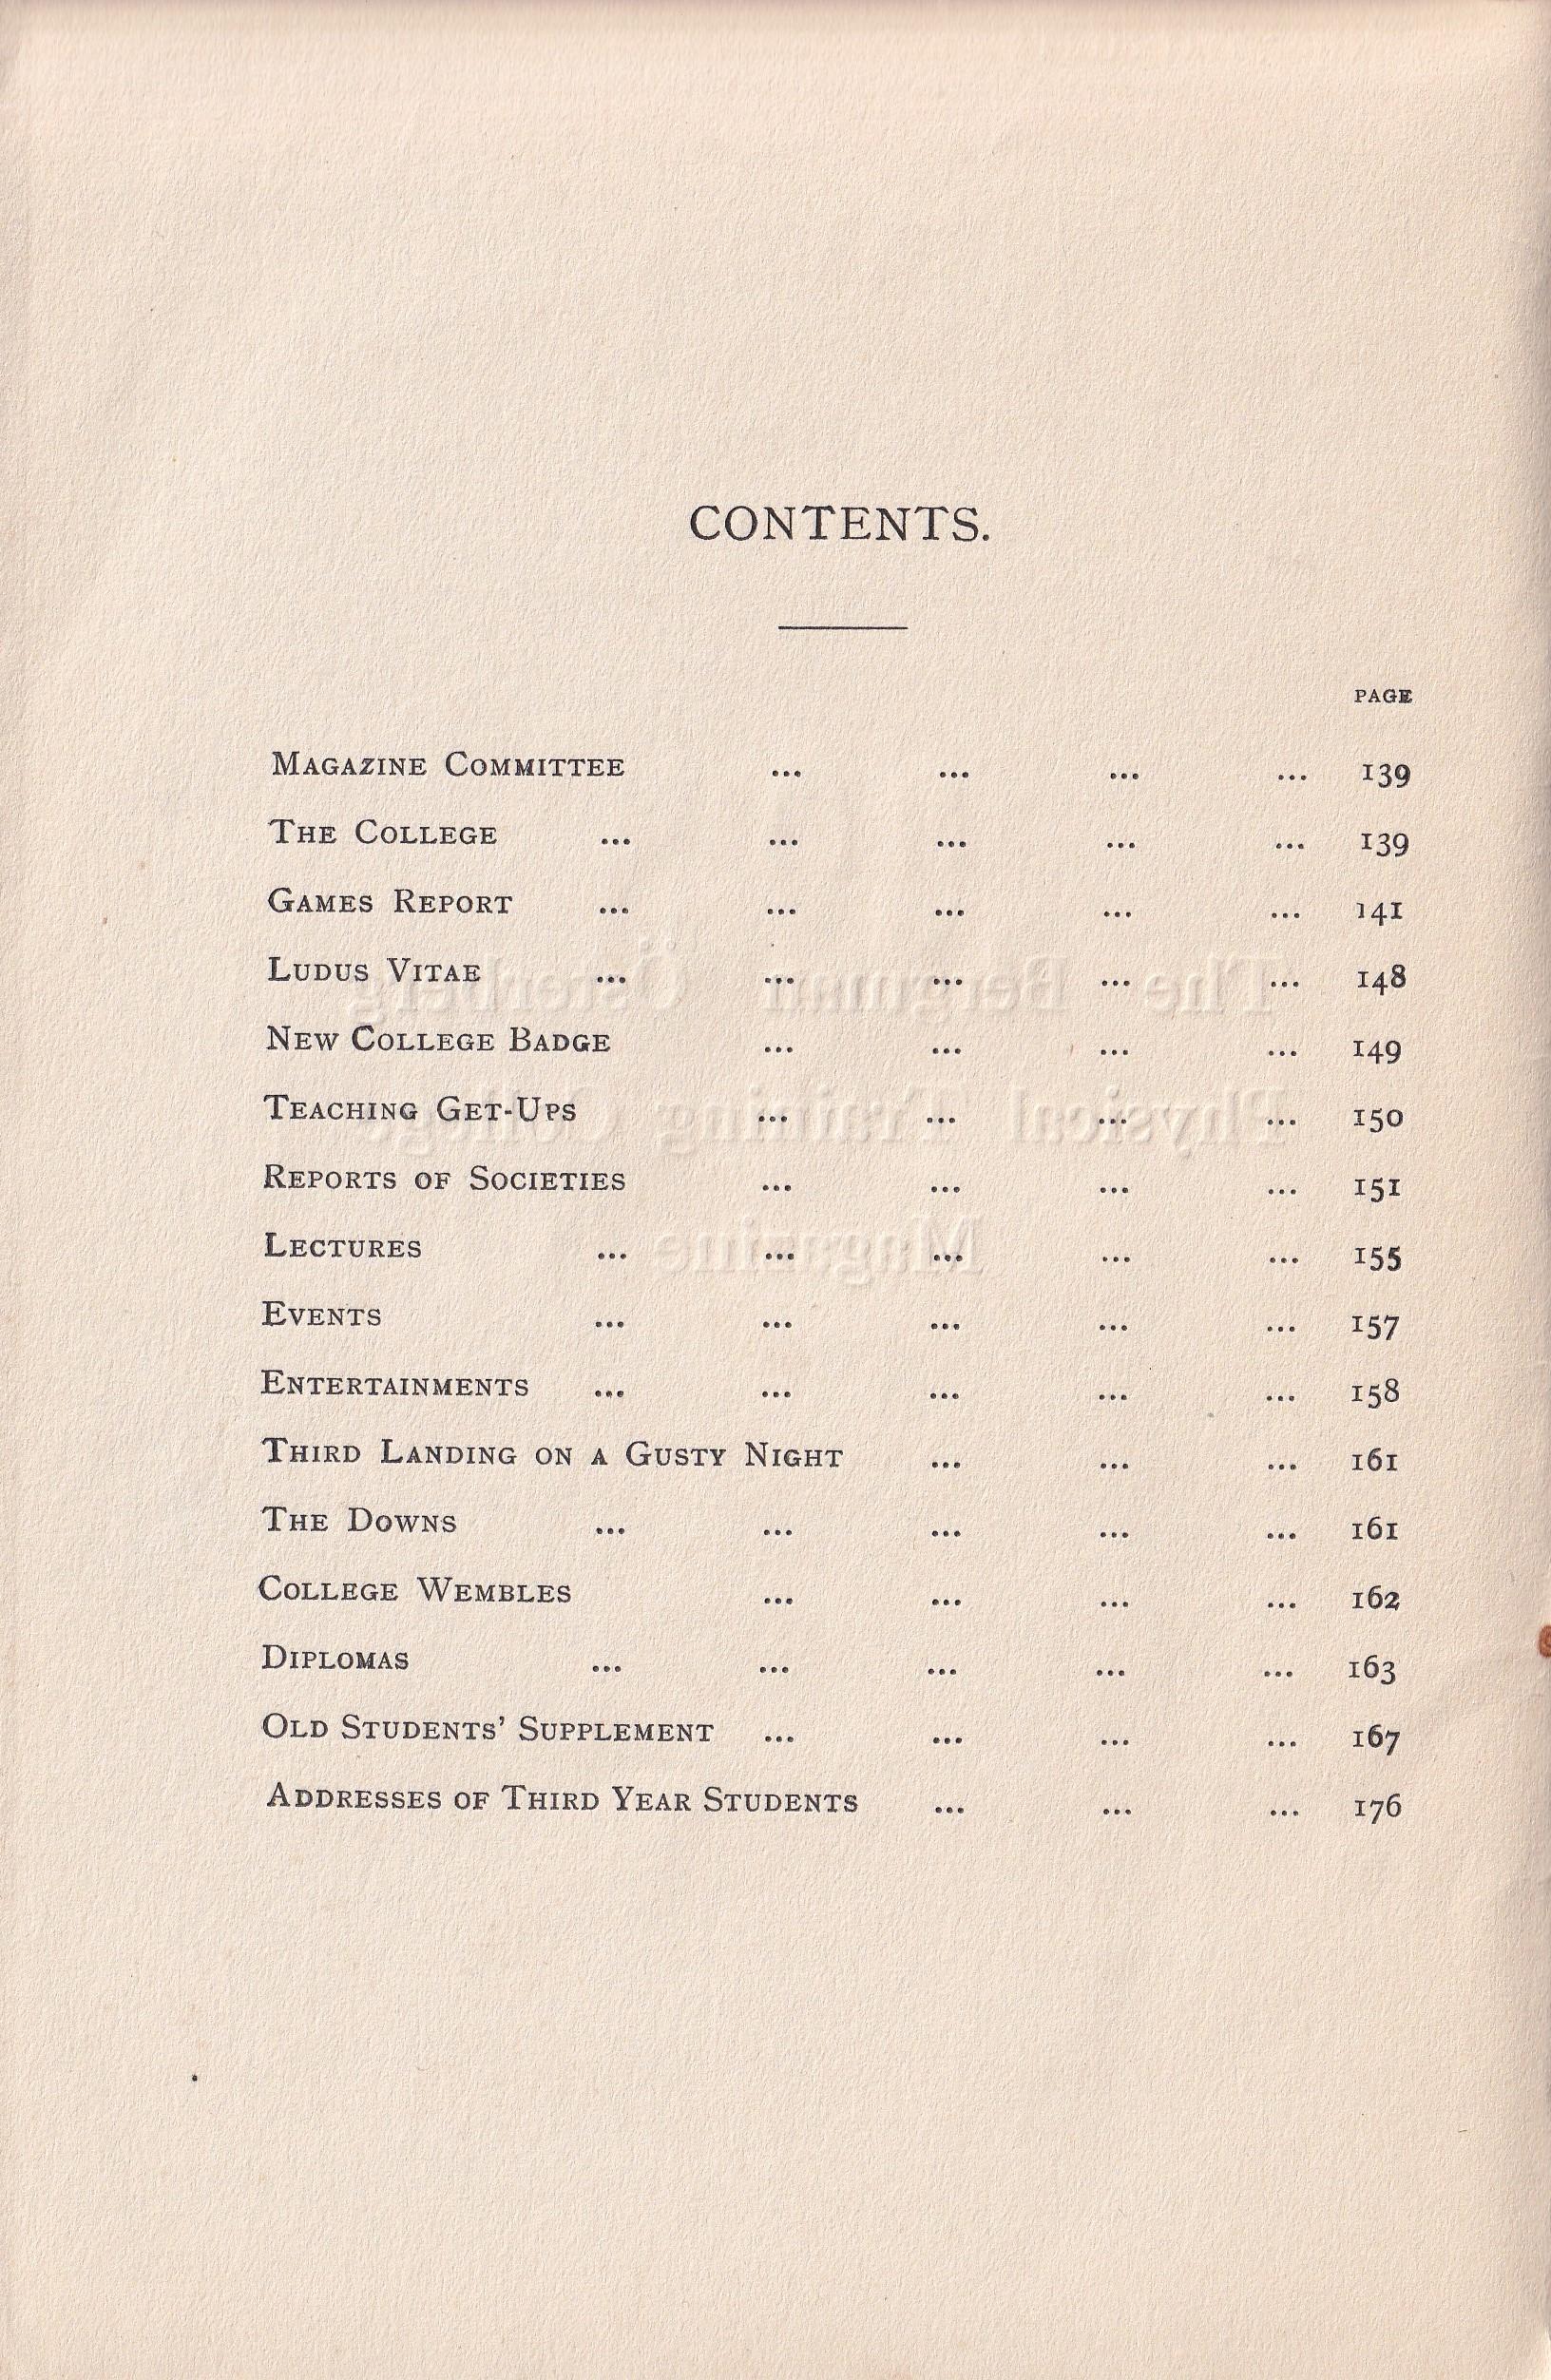 BOPTC 1924 Contents